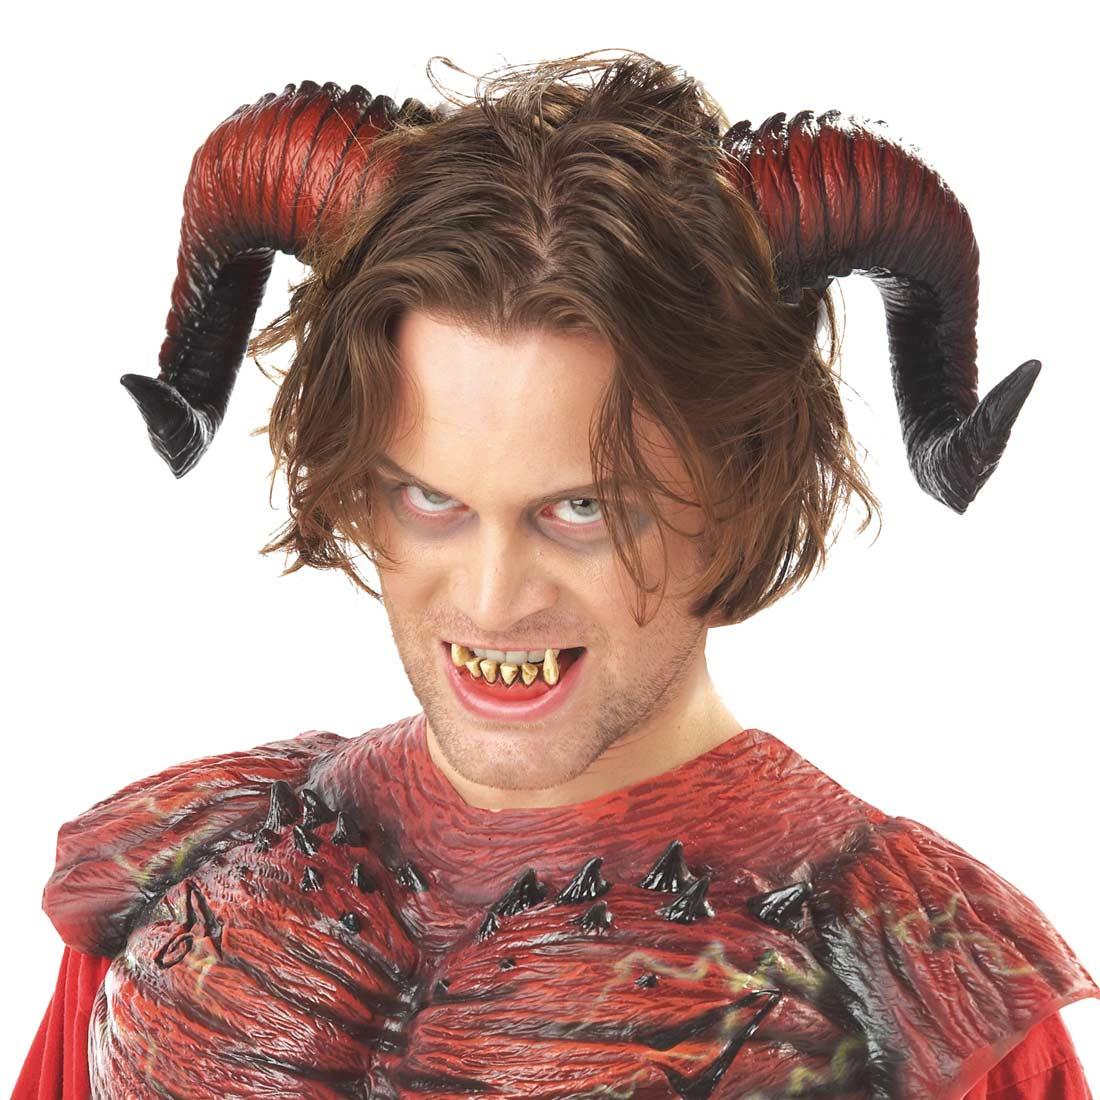 item specifics - Devil Horns For Halloween